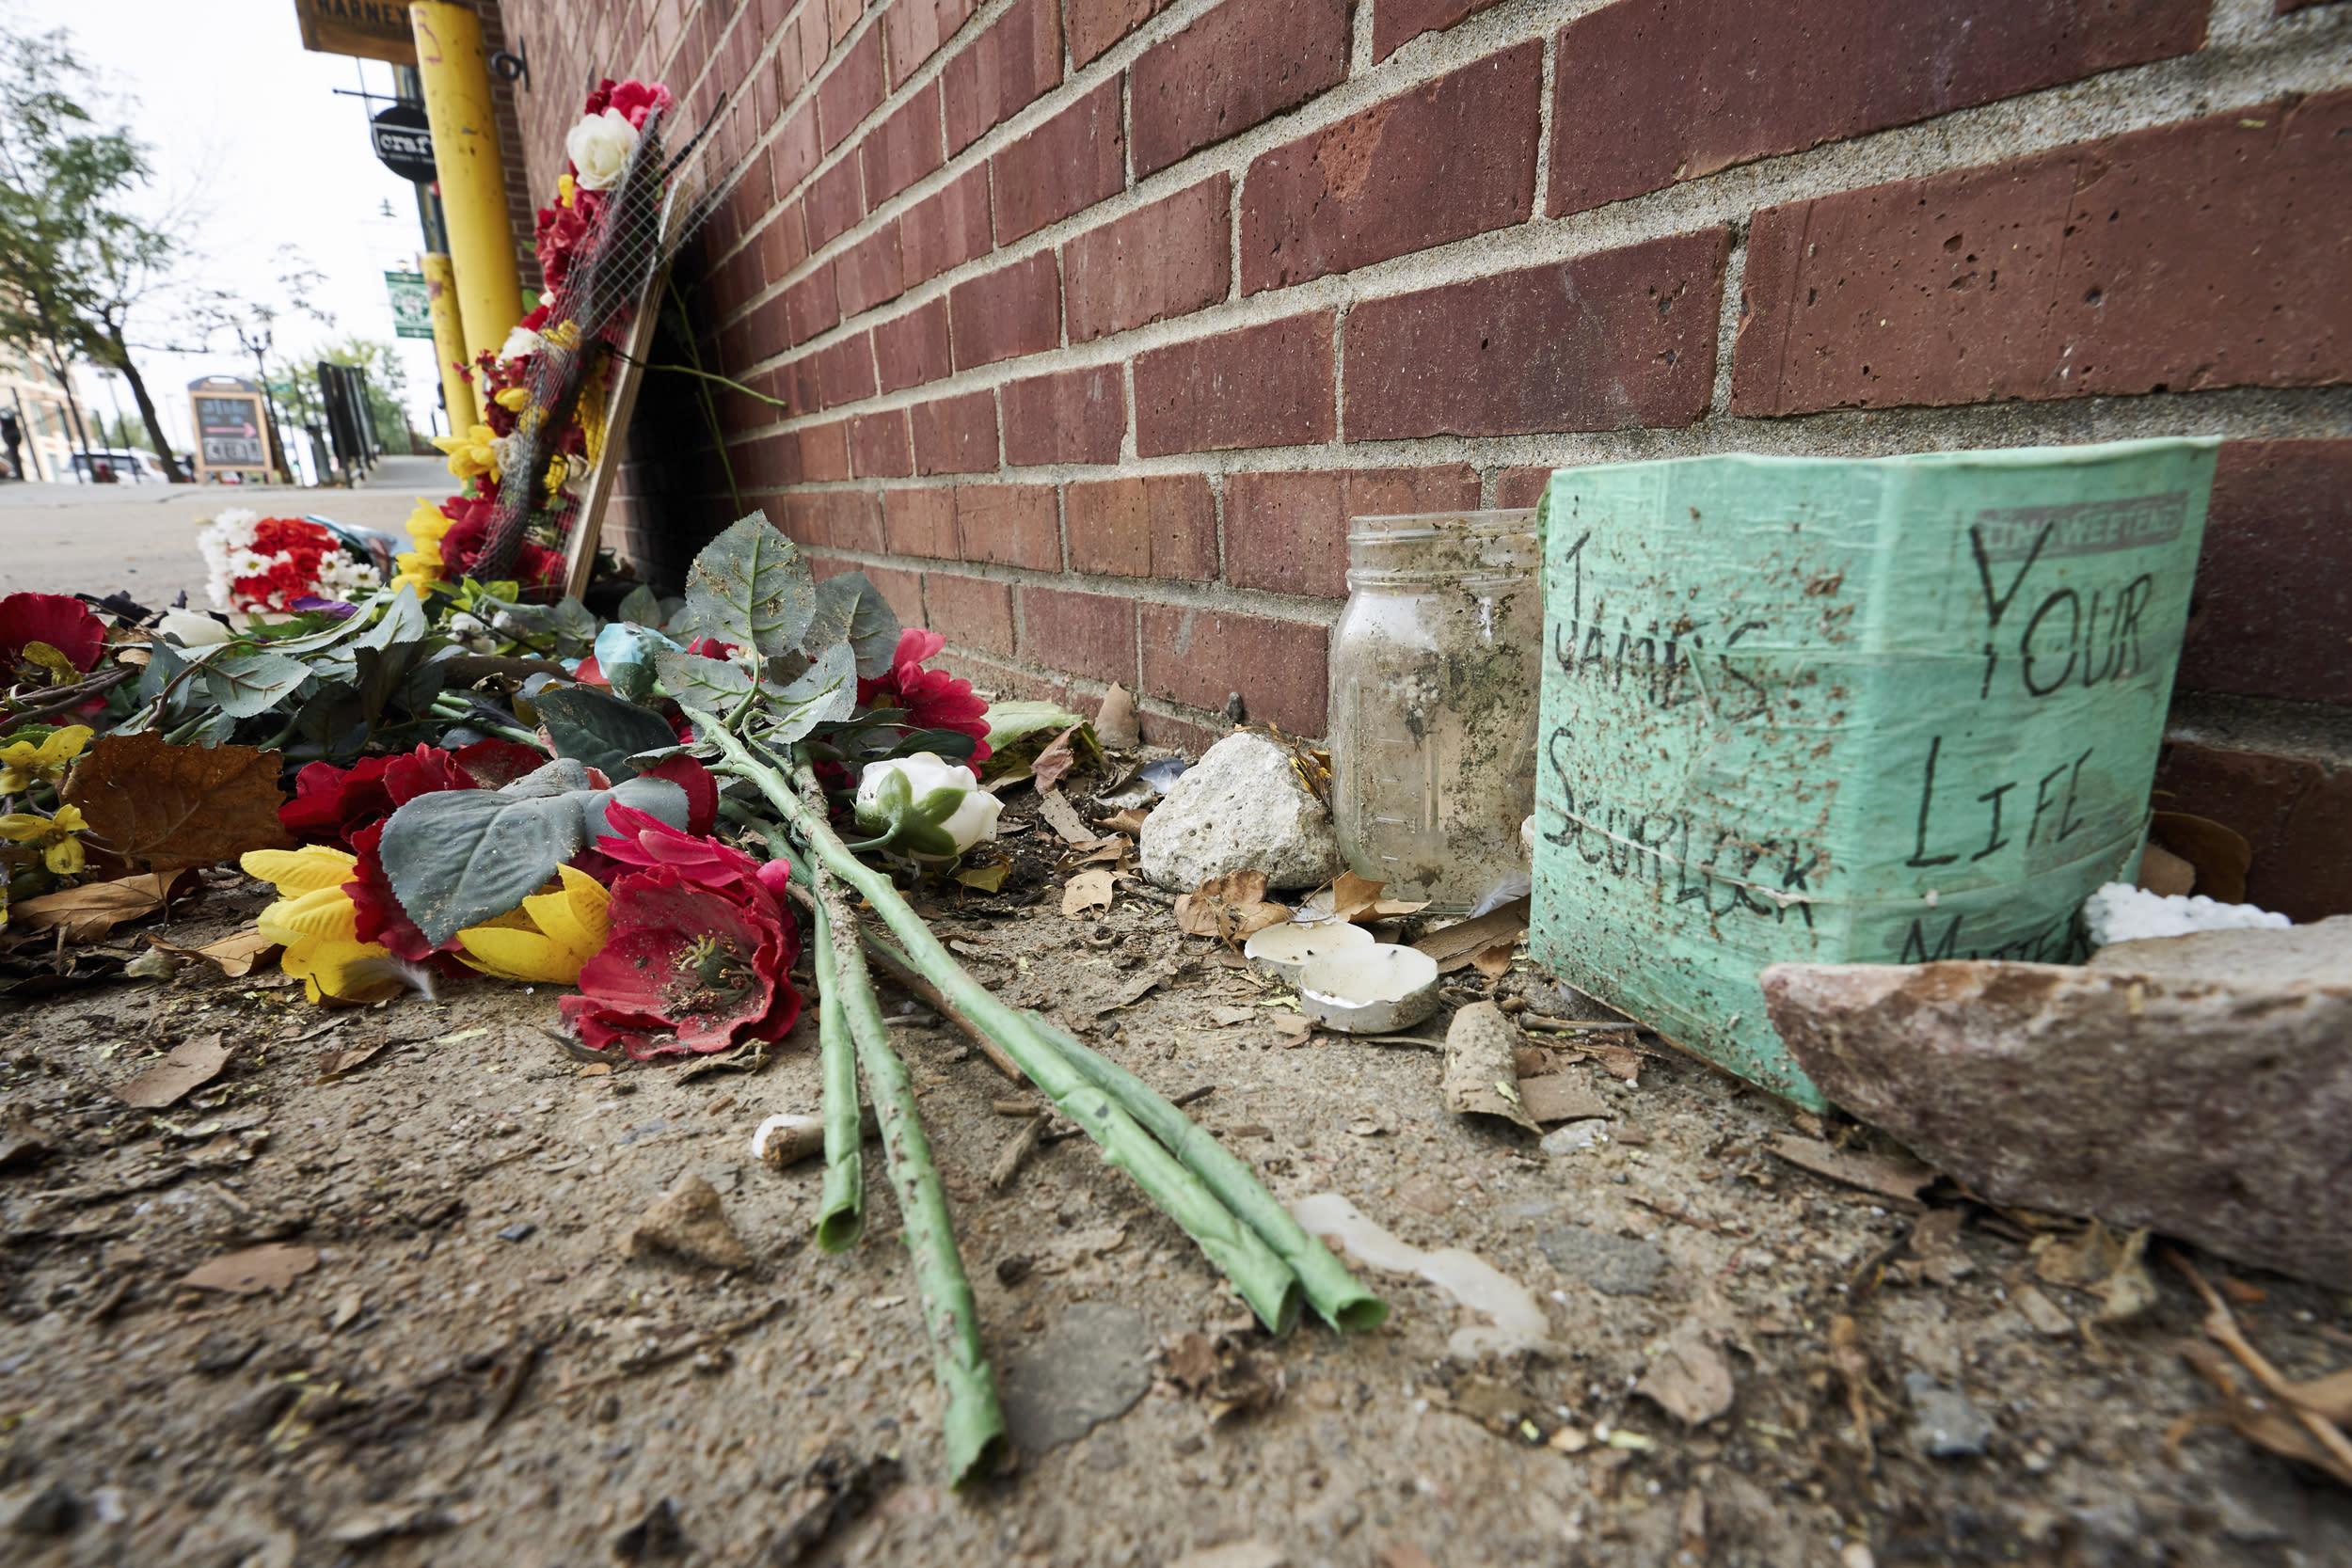 Nebraska bar owner charged in killing of Black man during George Floyd protests dies by suicide